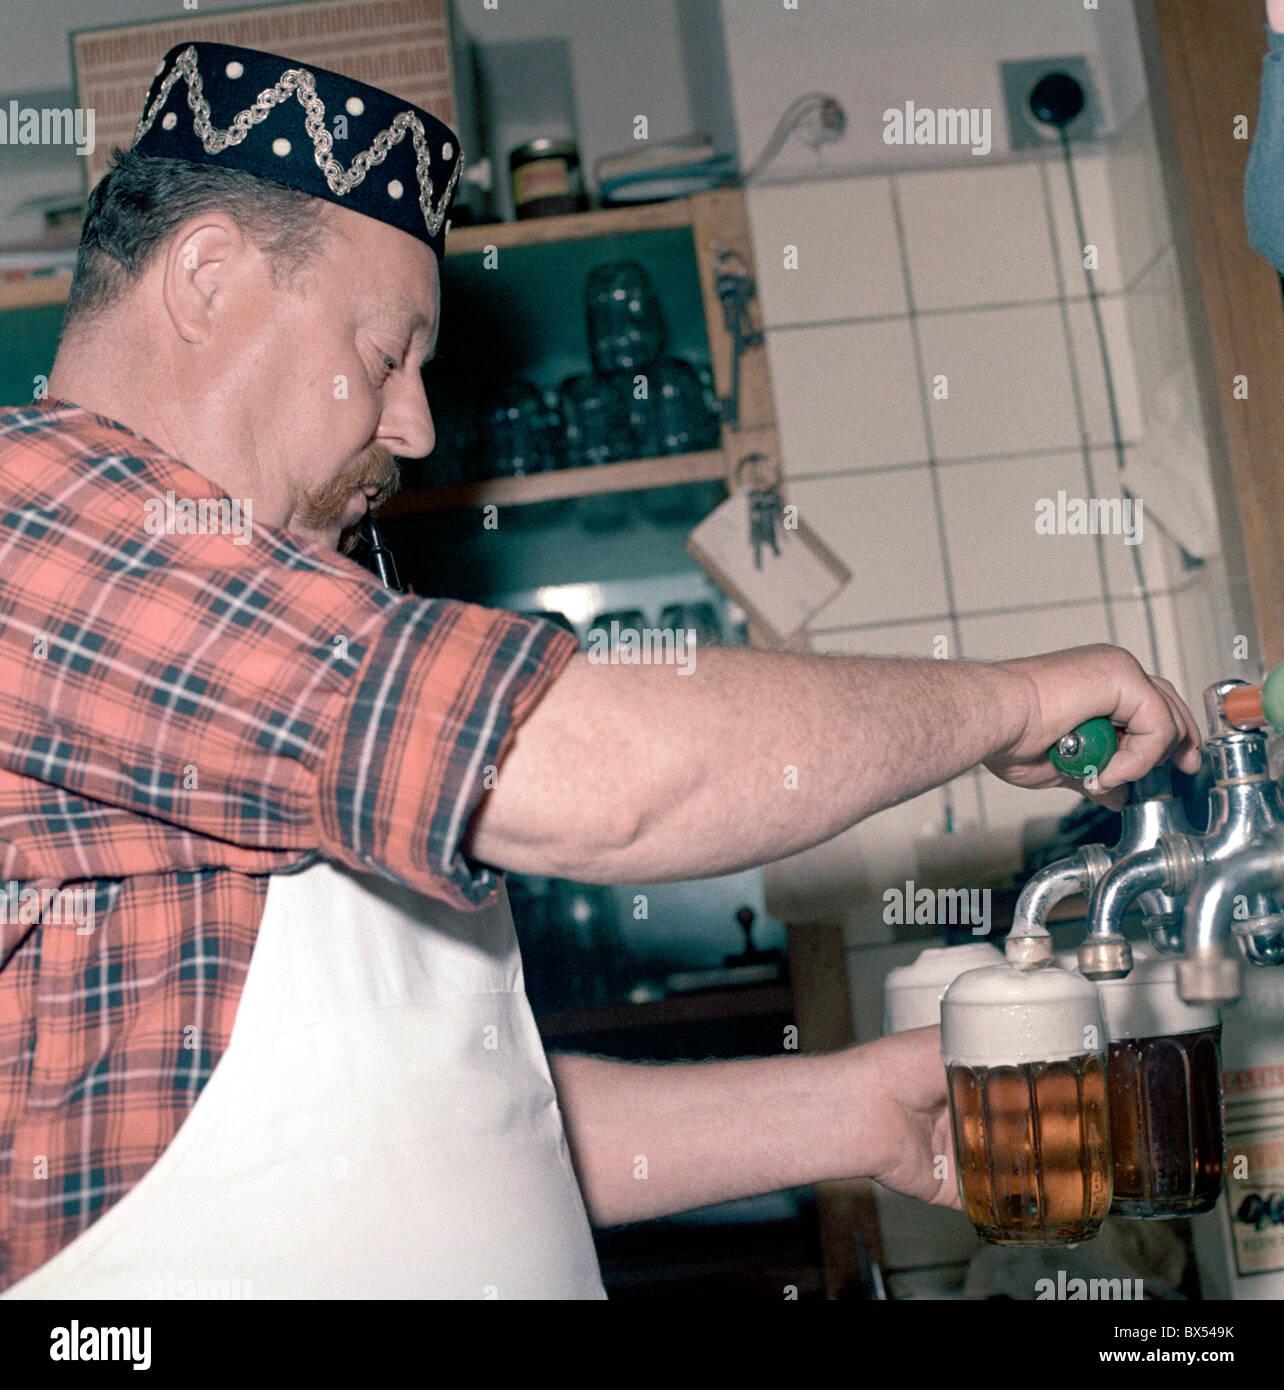 innkeeper, landlord, bartender, draught draft tap beer, glass, pipe, cap, pub, restaurant U Kalicha, Svejk Stock Photo